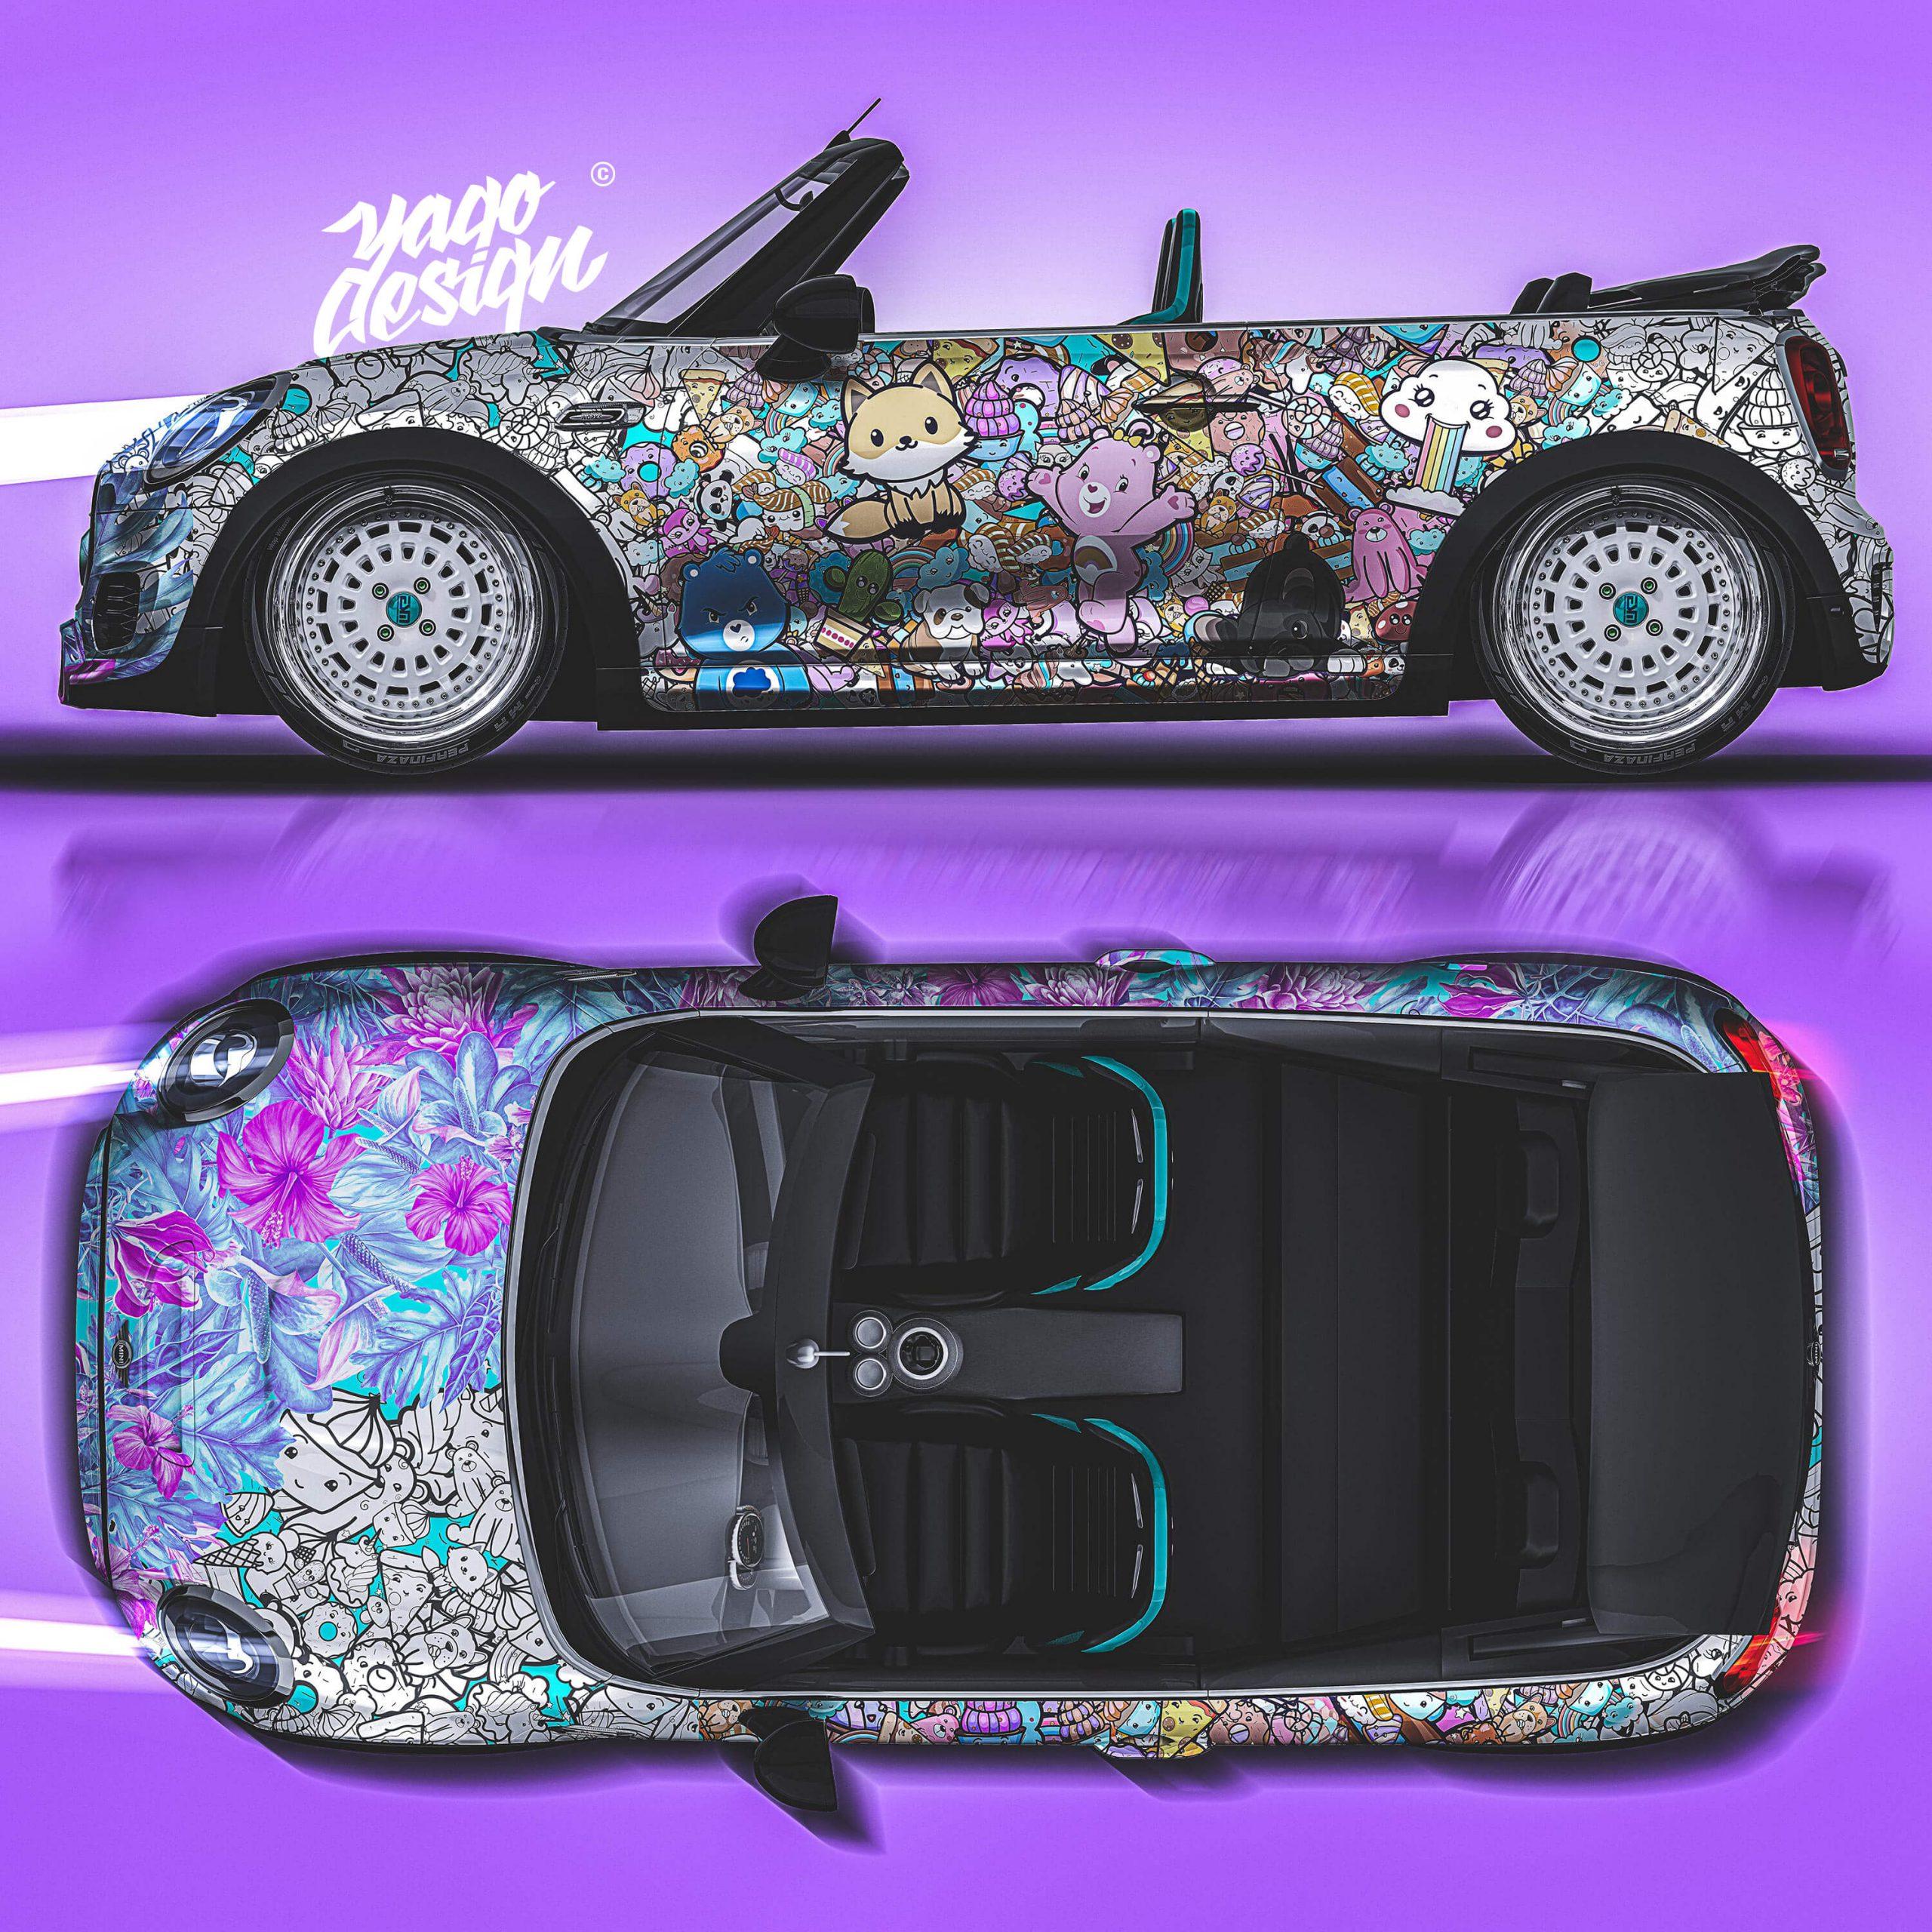 Mini-Cooper-Cabrio-by-Yagodesign1-scaled